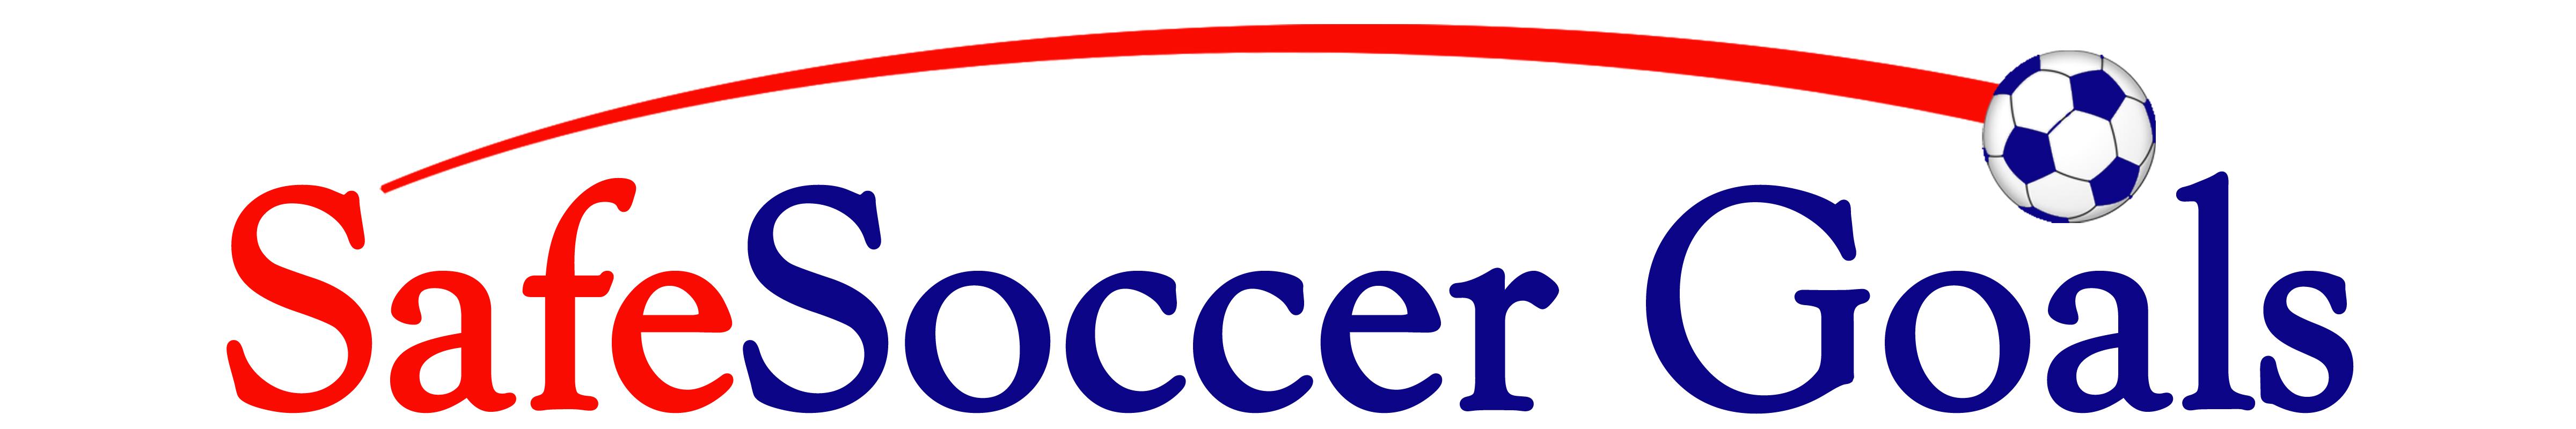 4800x800 Soccer Goals, Portable Soccer Goals, Safe Soccer Goals, Soccer